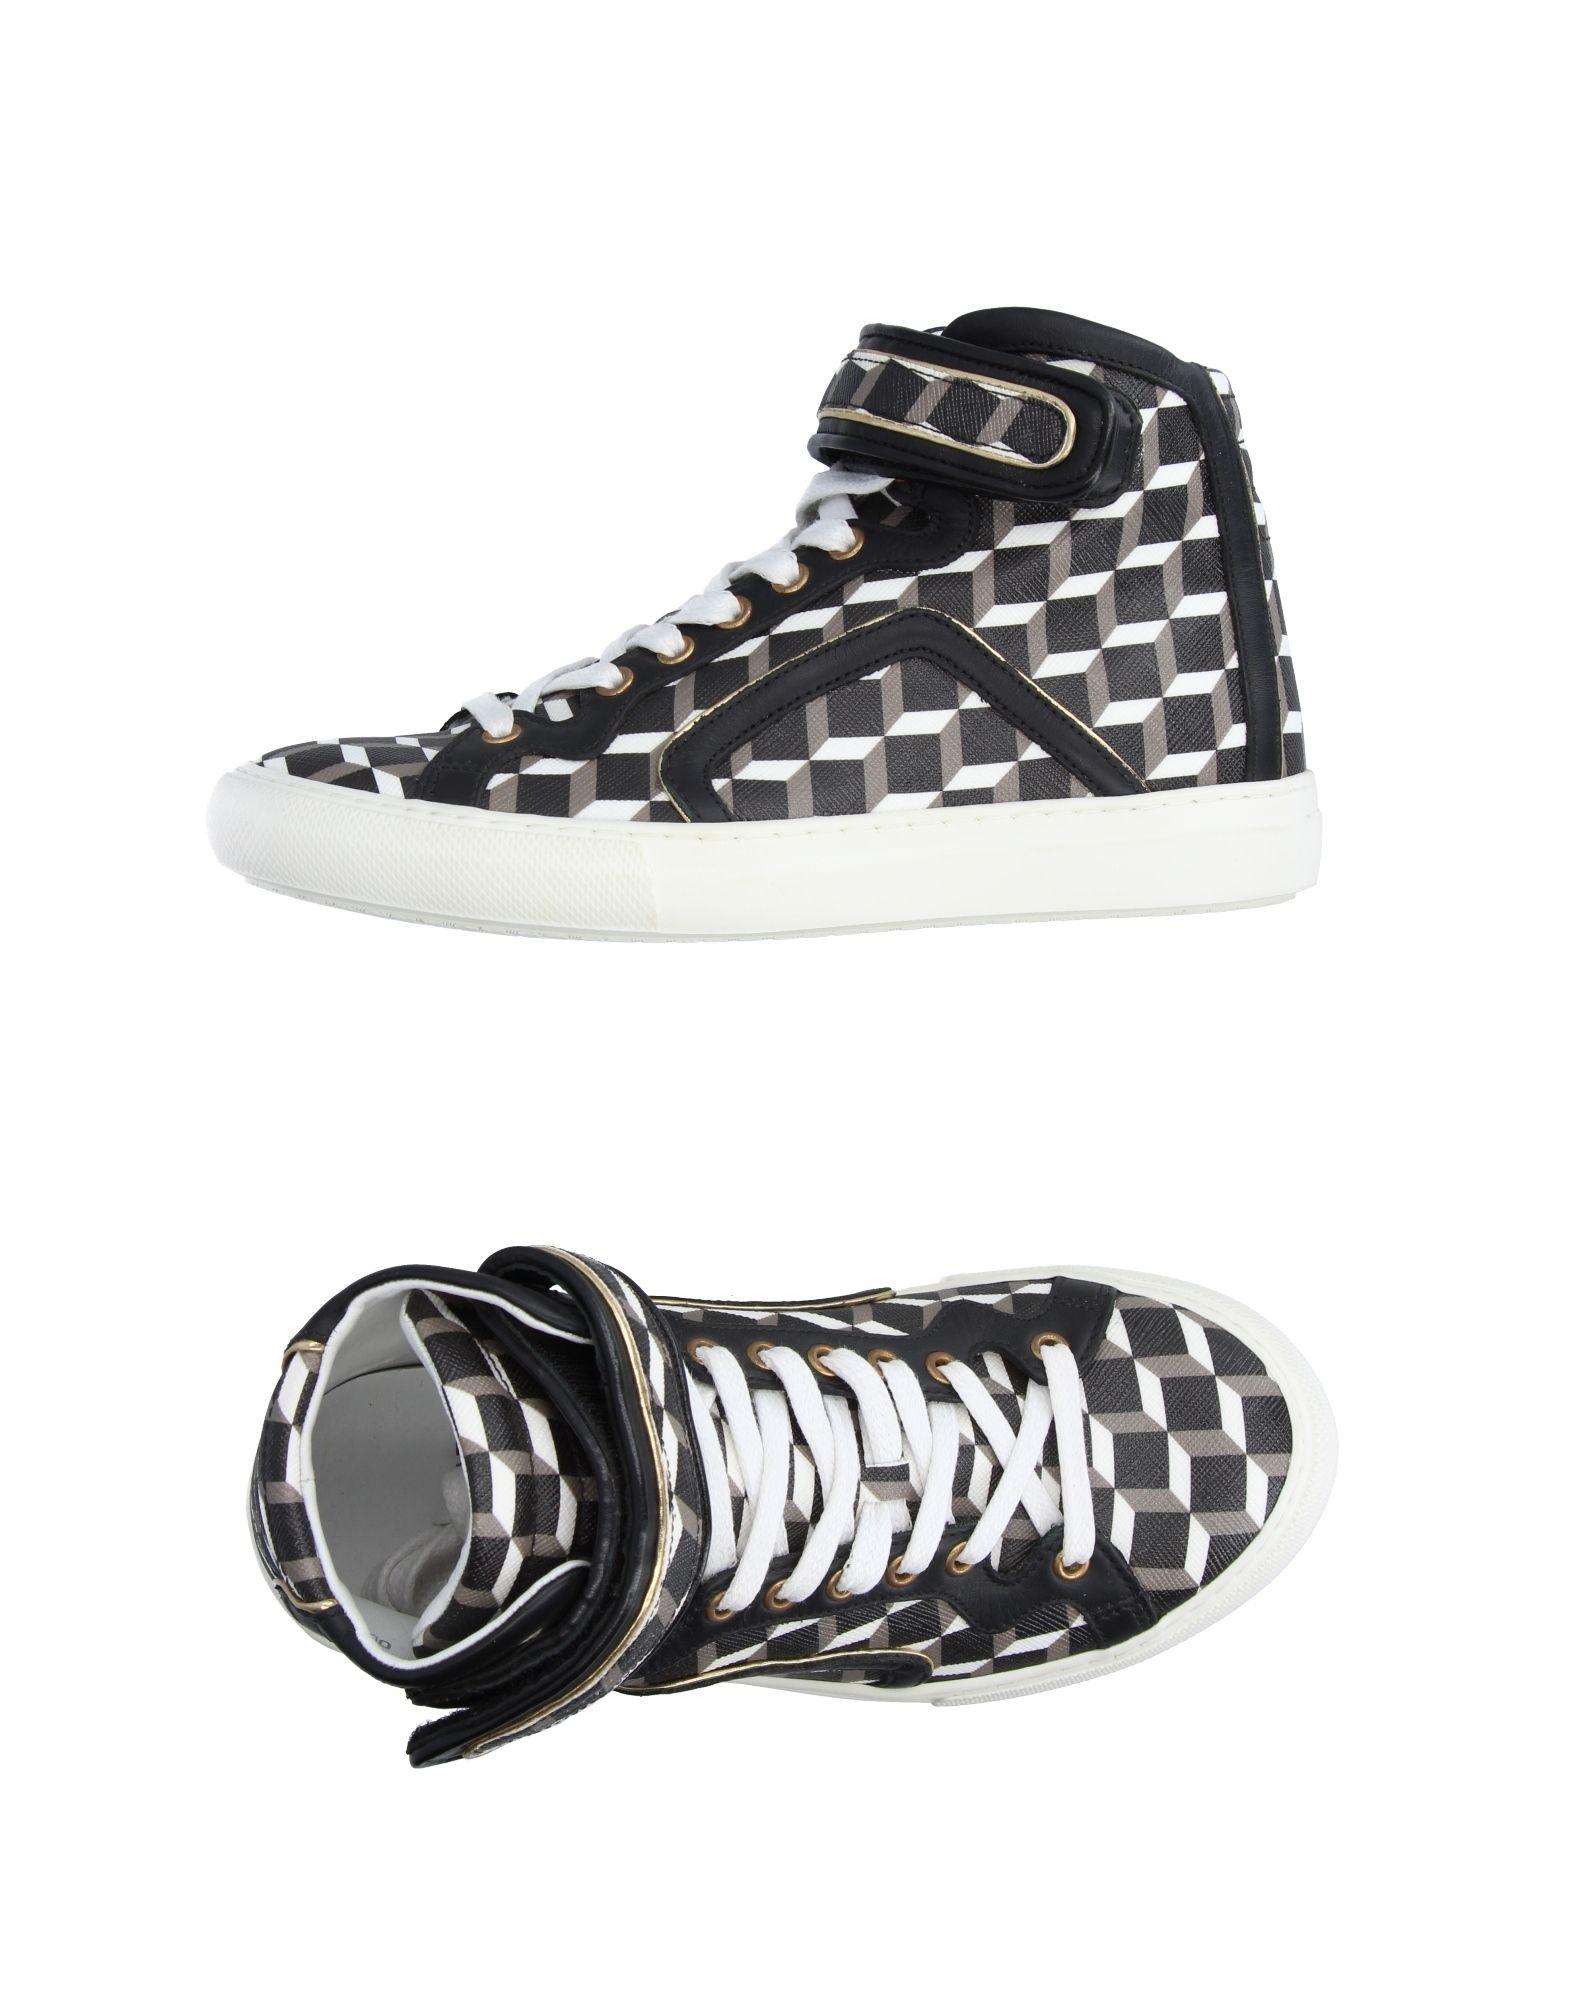 Rabatt Schuhe Sneakers Pierre Hardy Sneakers Schuhe Damen  11229634AI ab8557